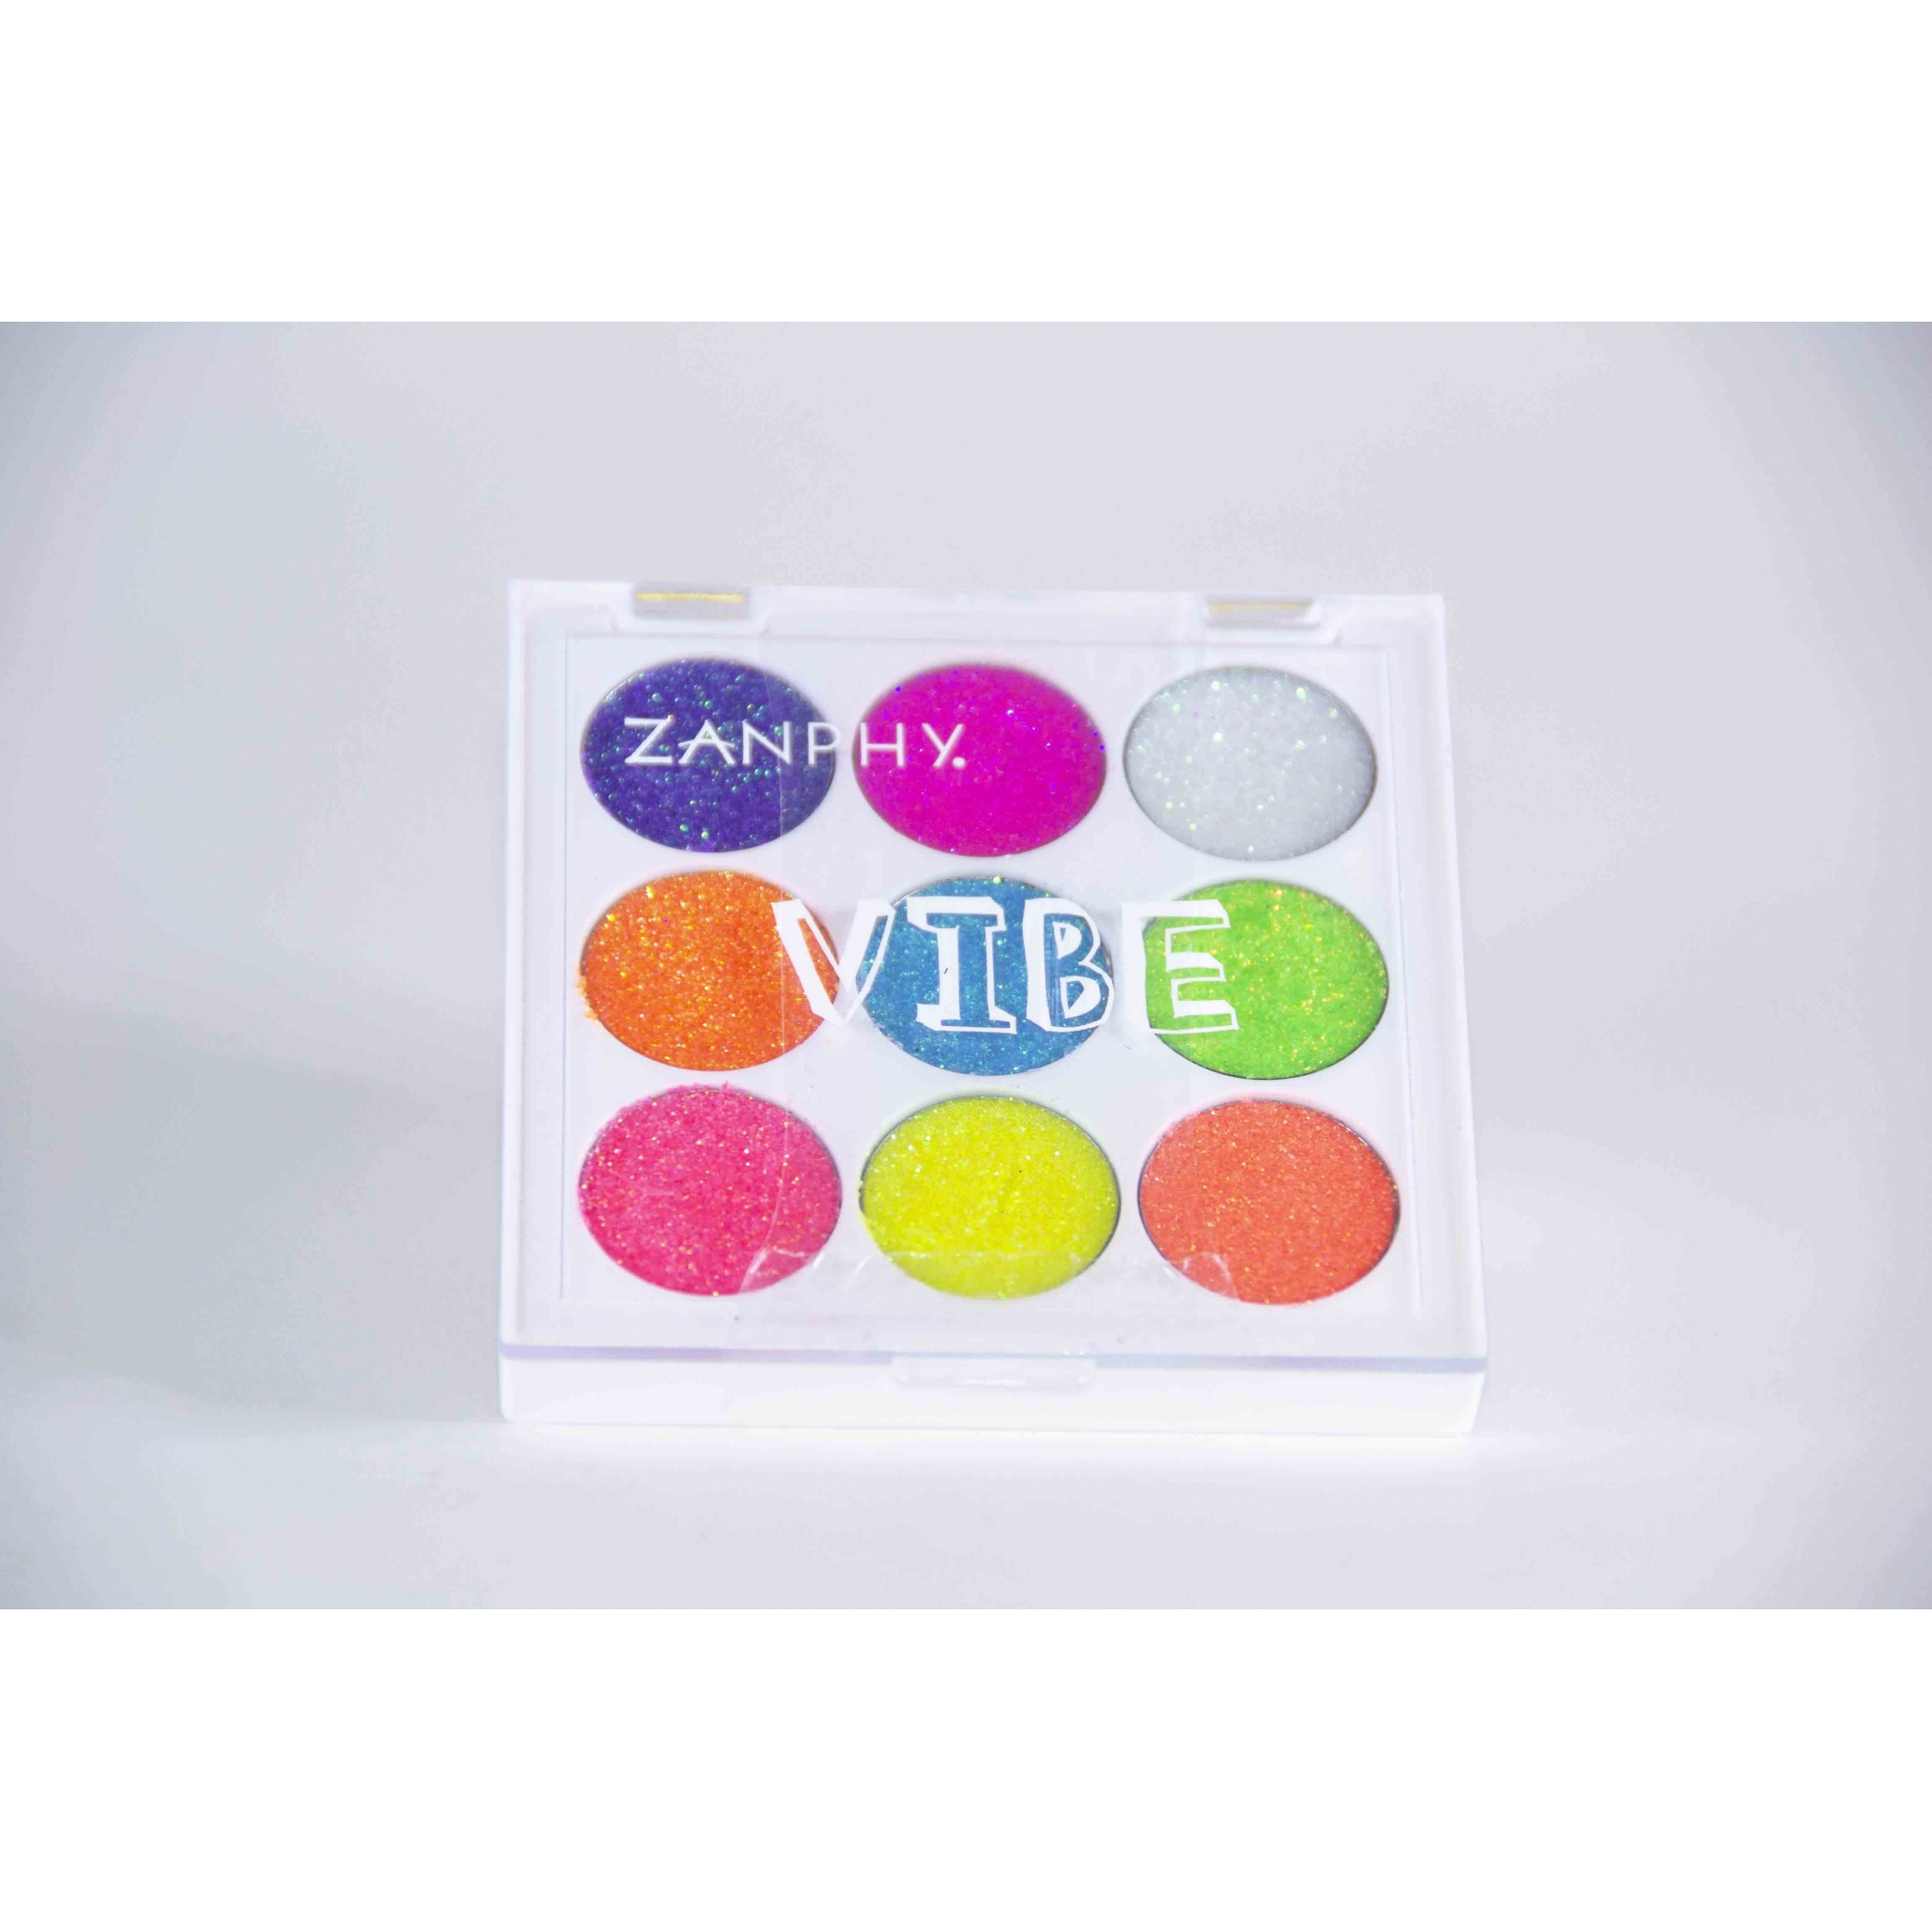 Paleta De Glitter Neon Linha Vibe 9 Cores 01 (1,3G Cada) - Zamphy